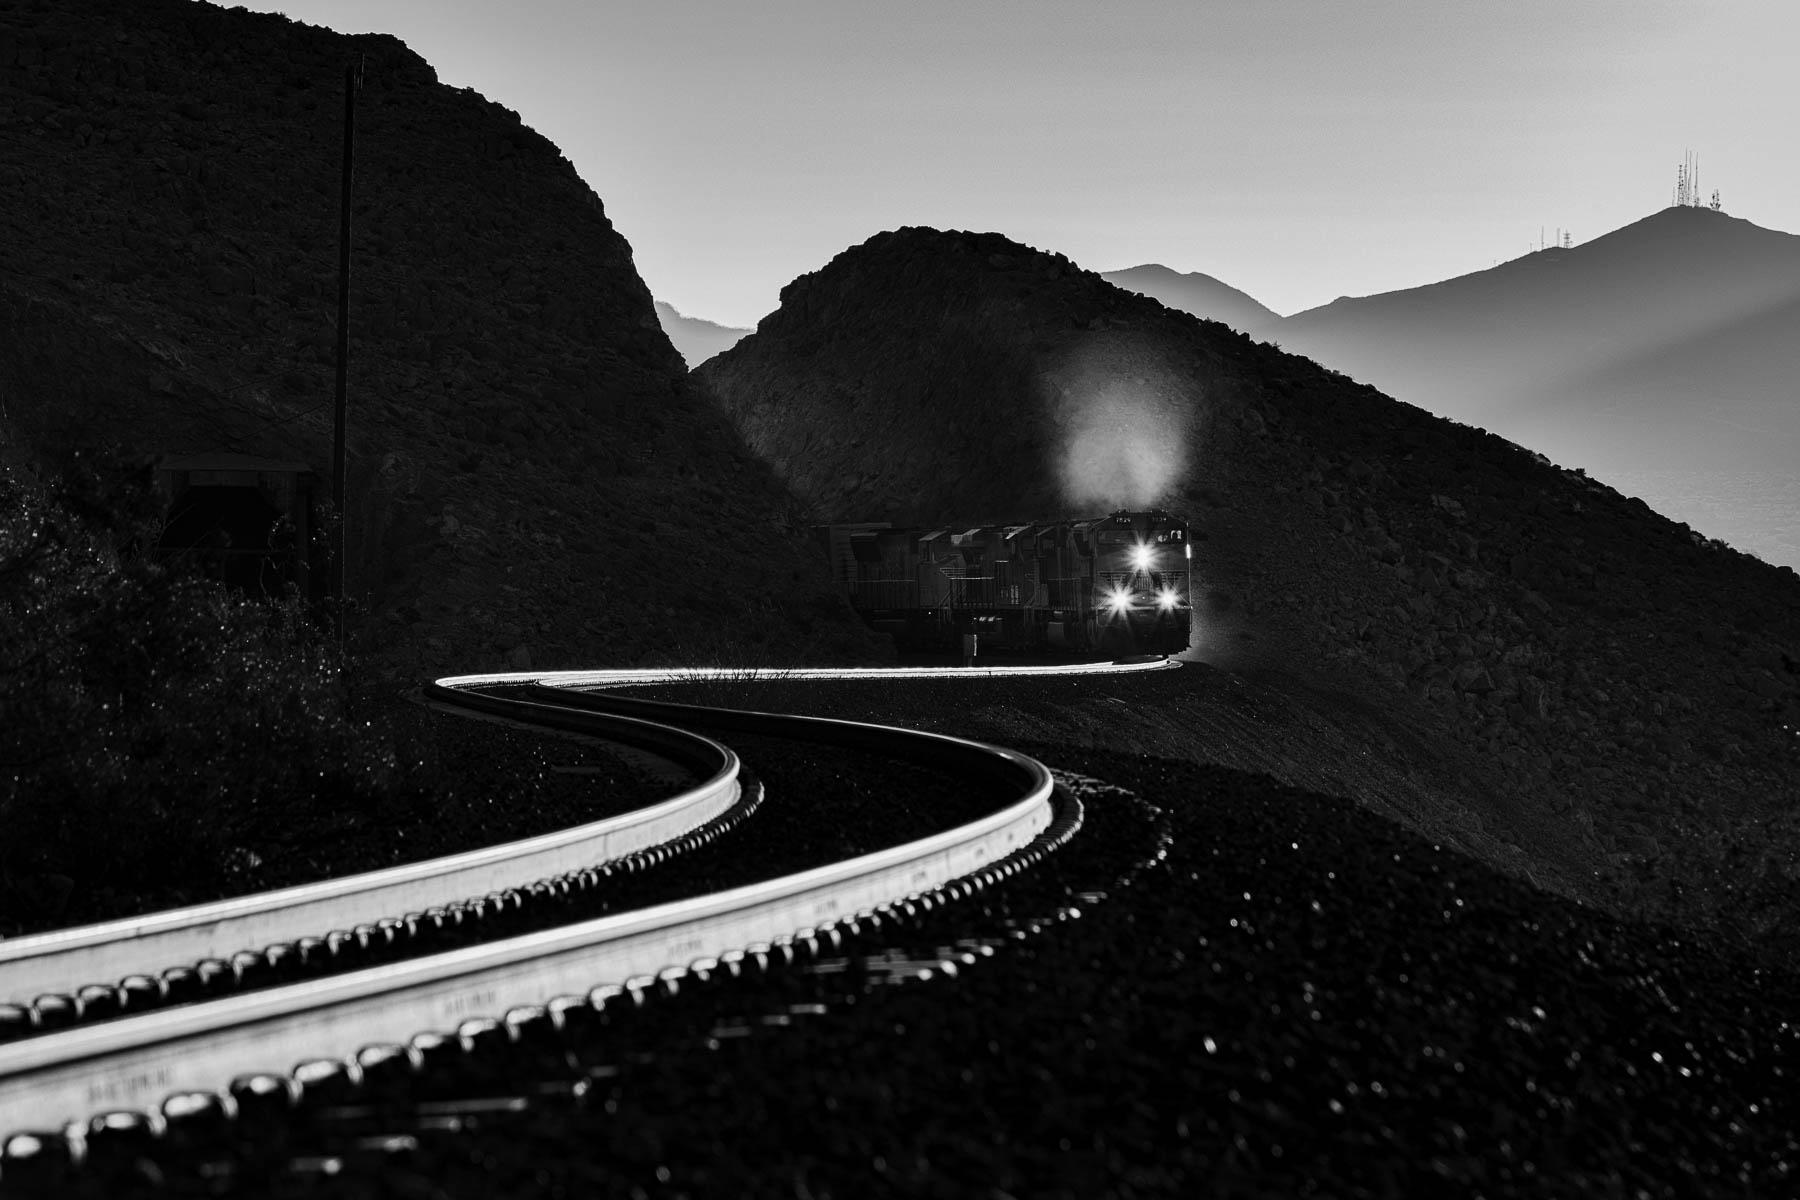 34_Eric_Williams_Conduits of Steel_Desert Passage_4.jpg